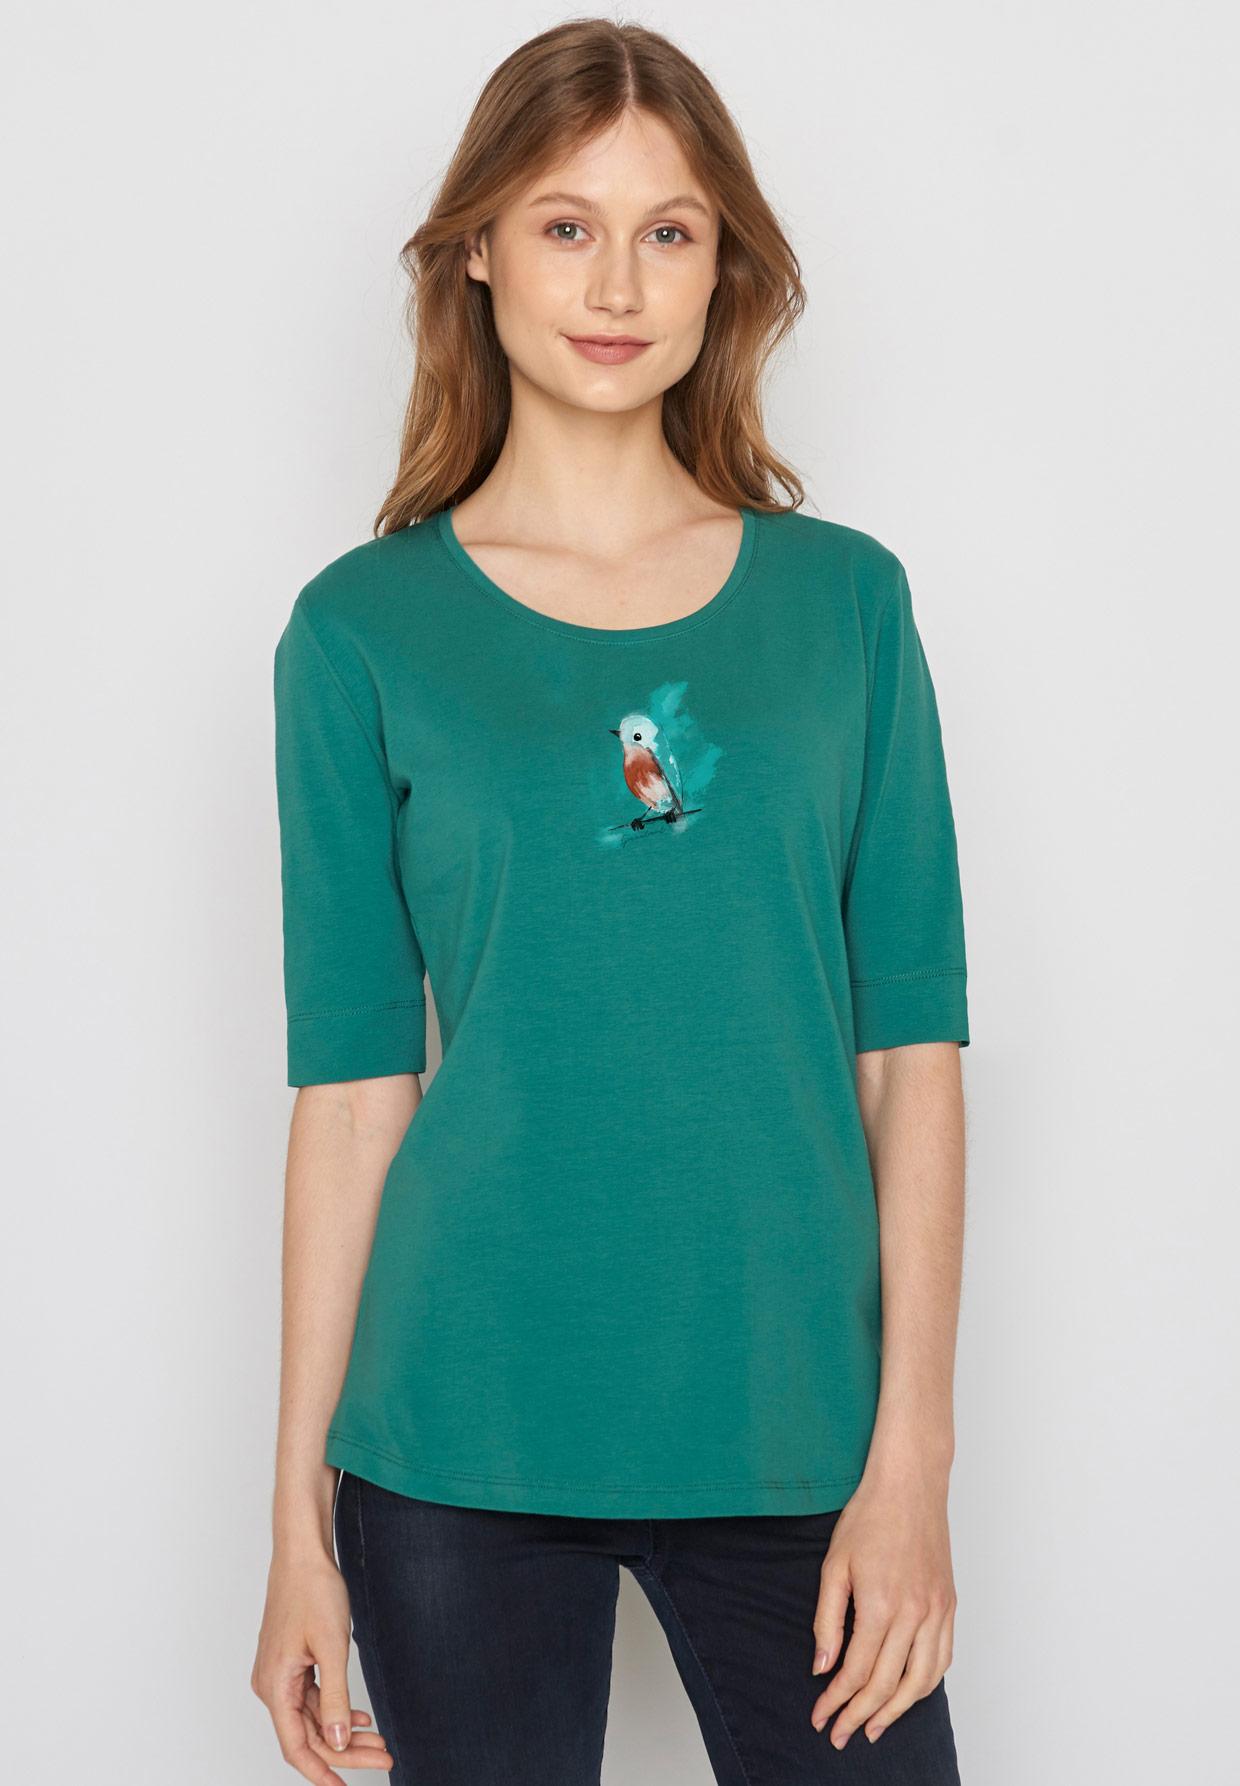 GREENBOMB-ANIMAL-BIRDIE-Deep-Shirt-jungle-green